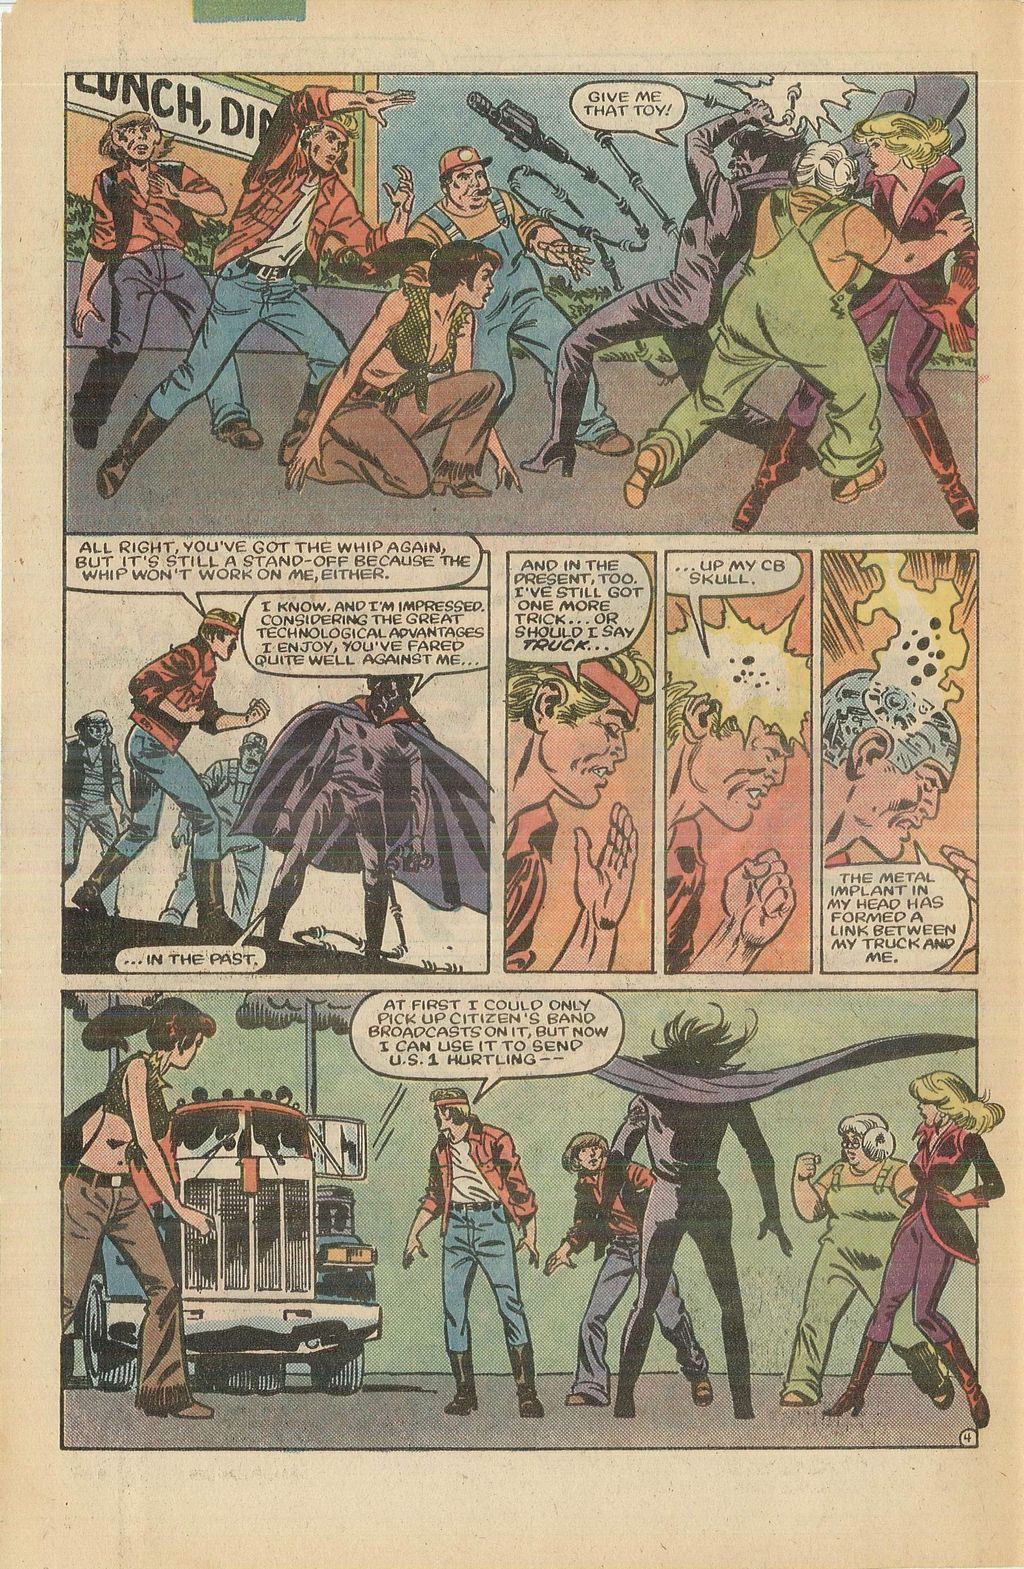 Read online U.S. 1 comic -  Issue #10 - 6